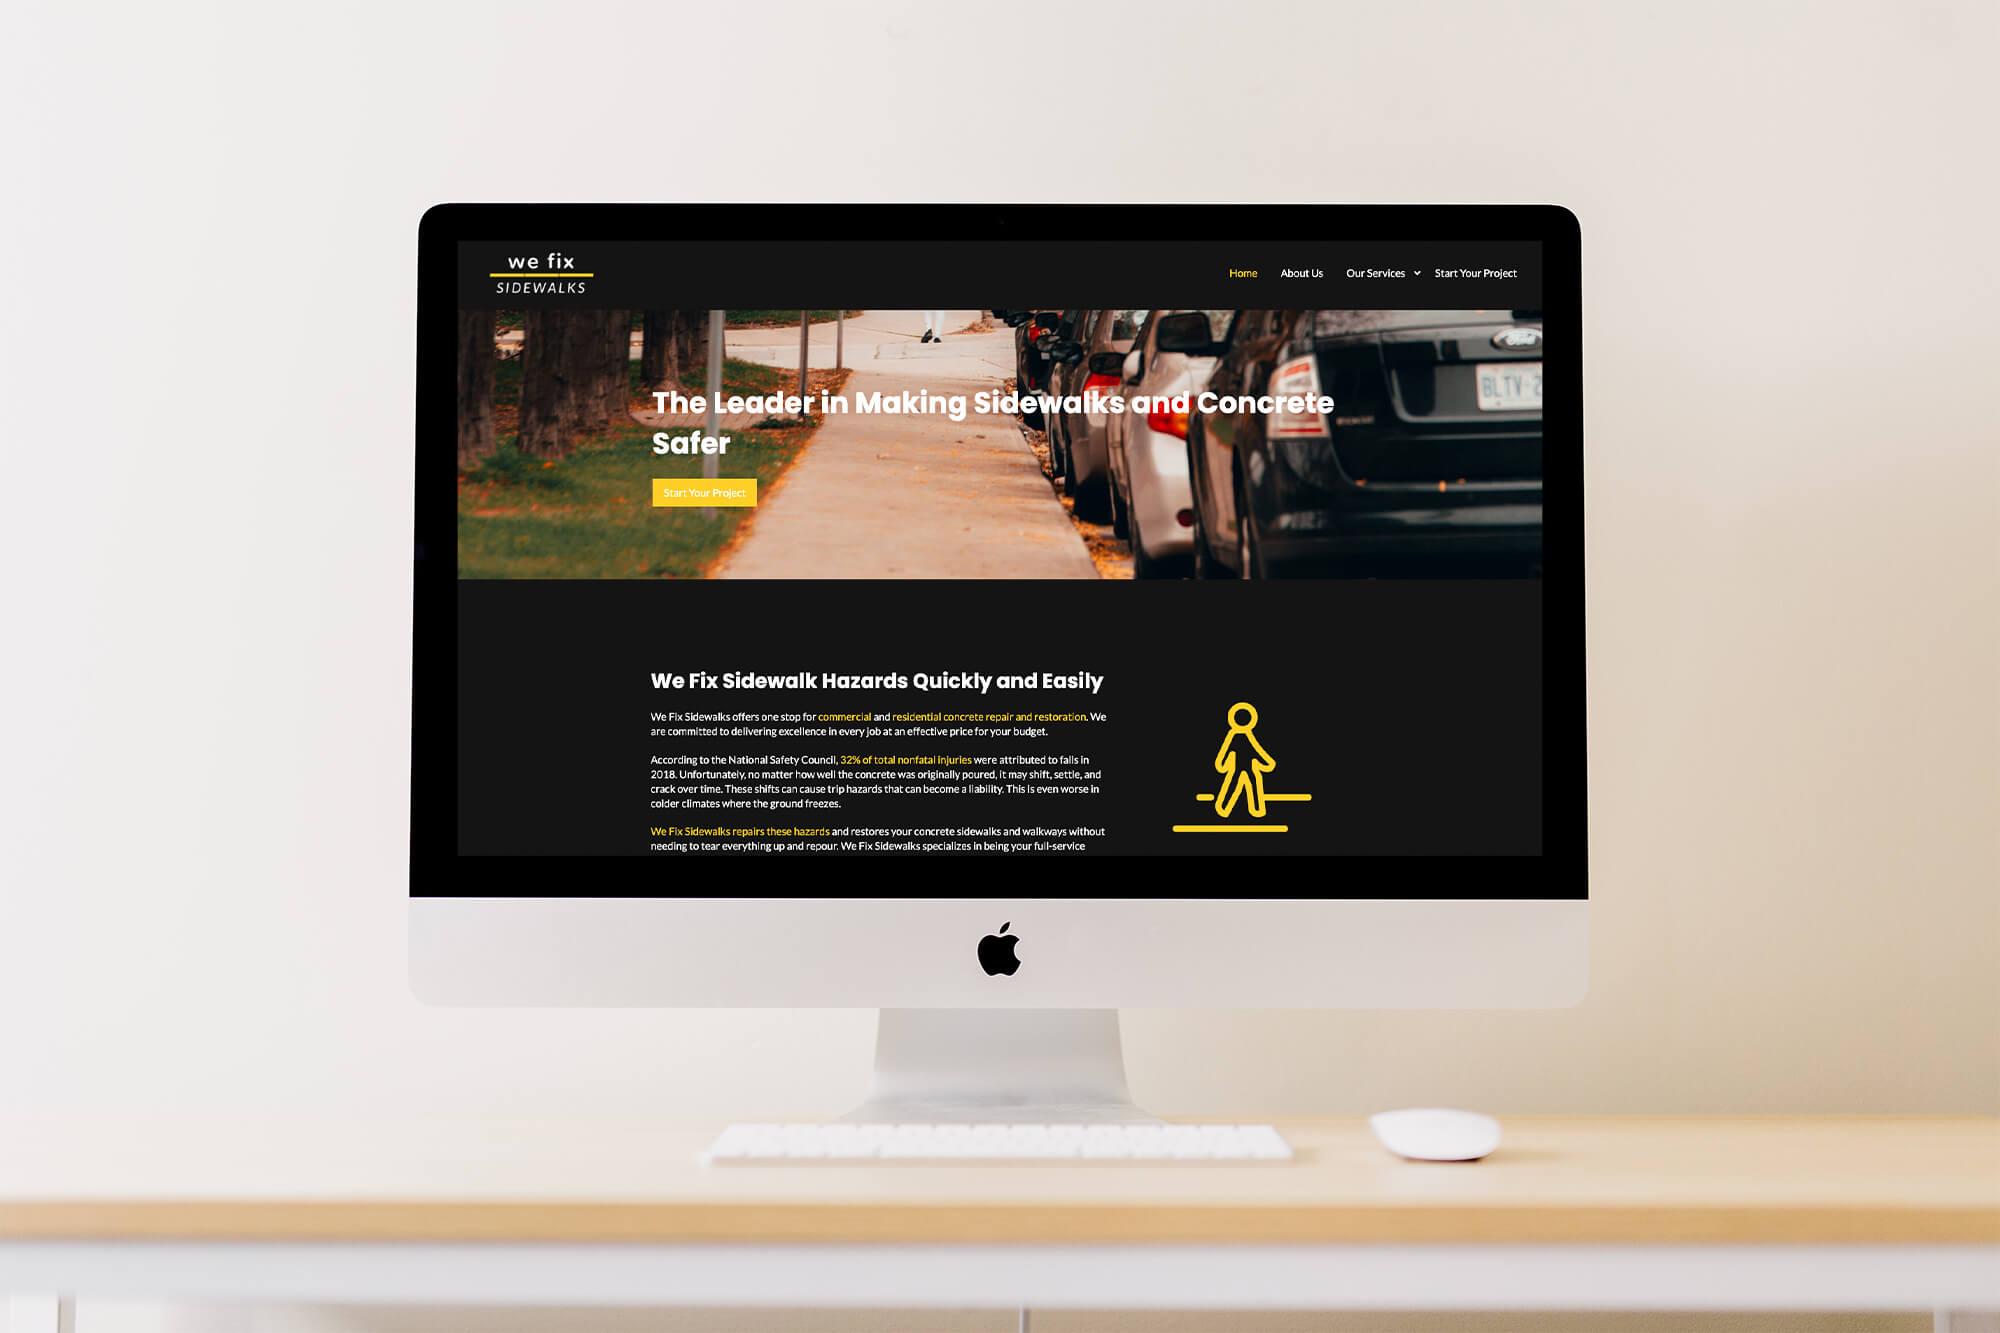 we fix sidewalks website screenshot